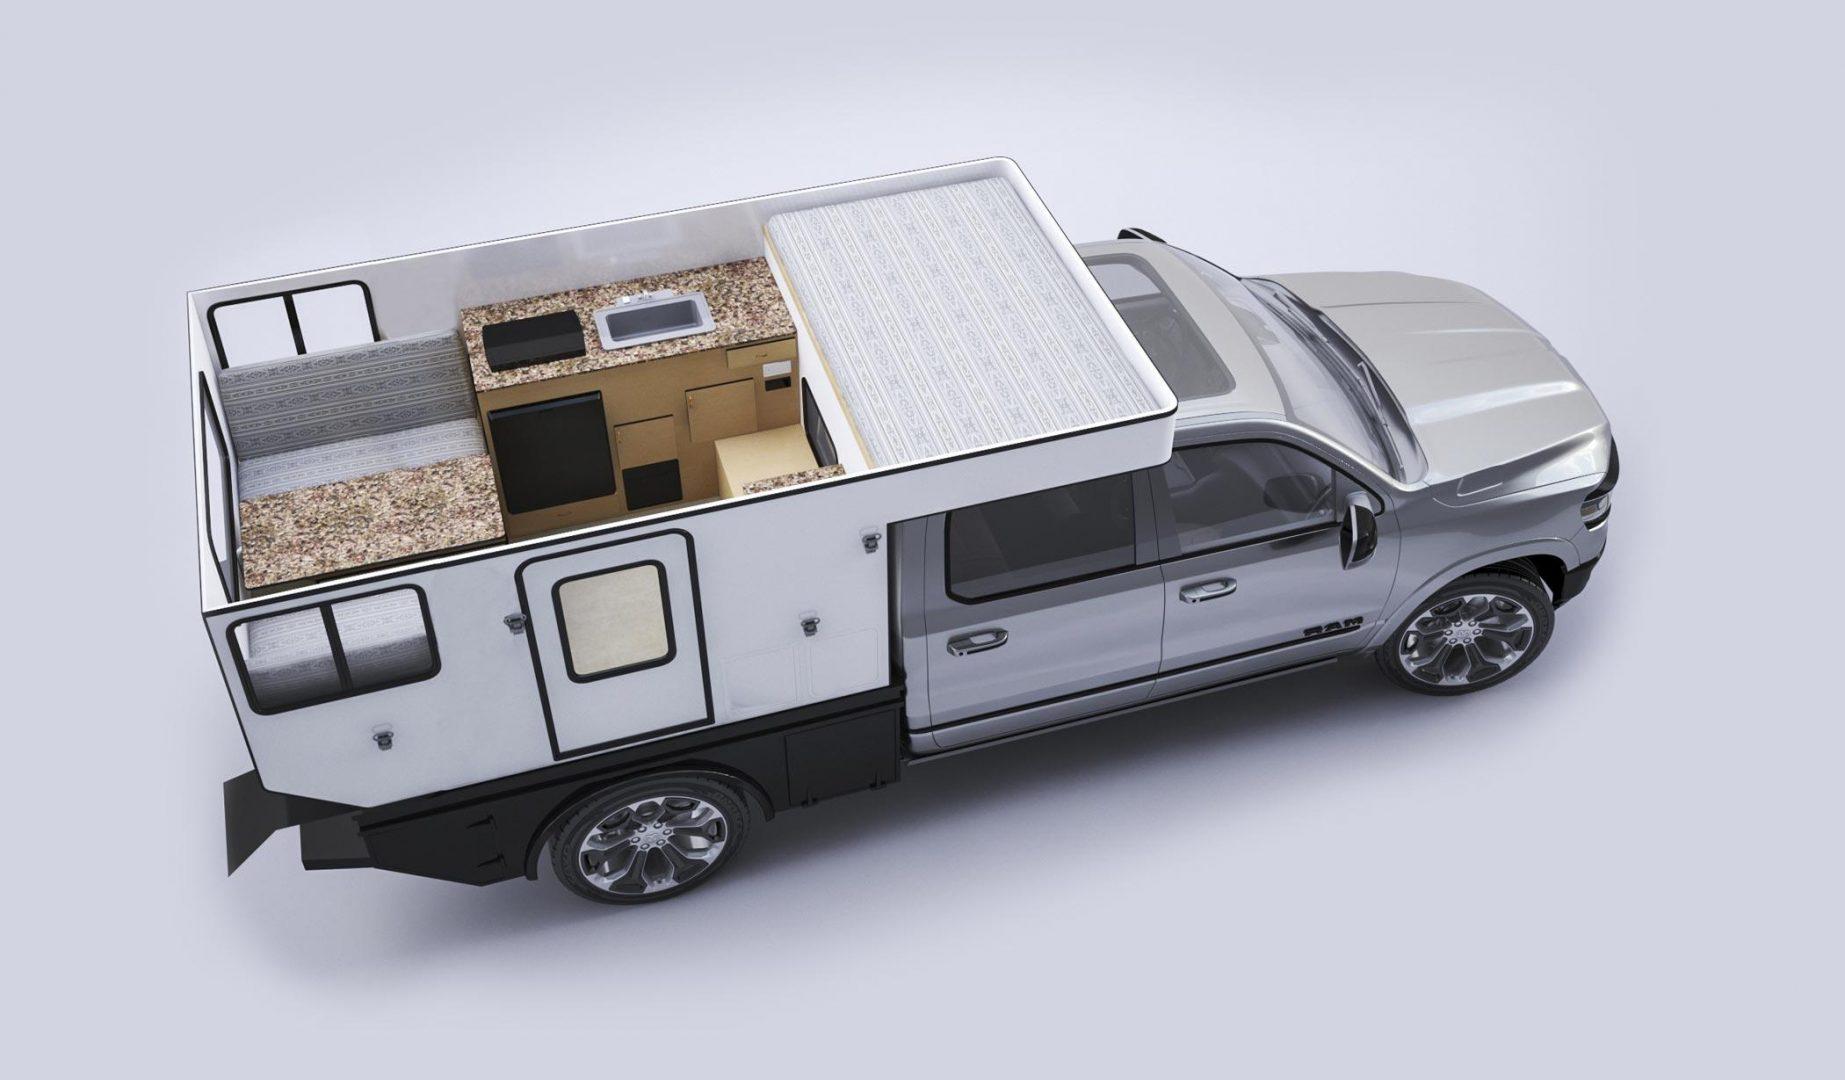 Flat Bed Model: $28,395